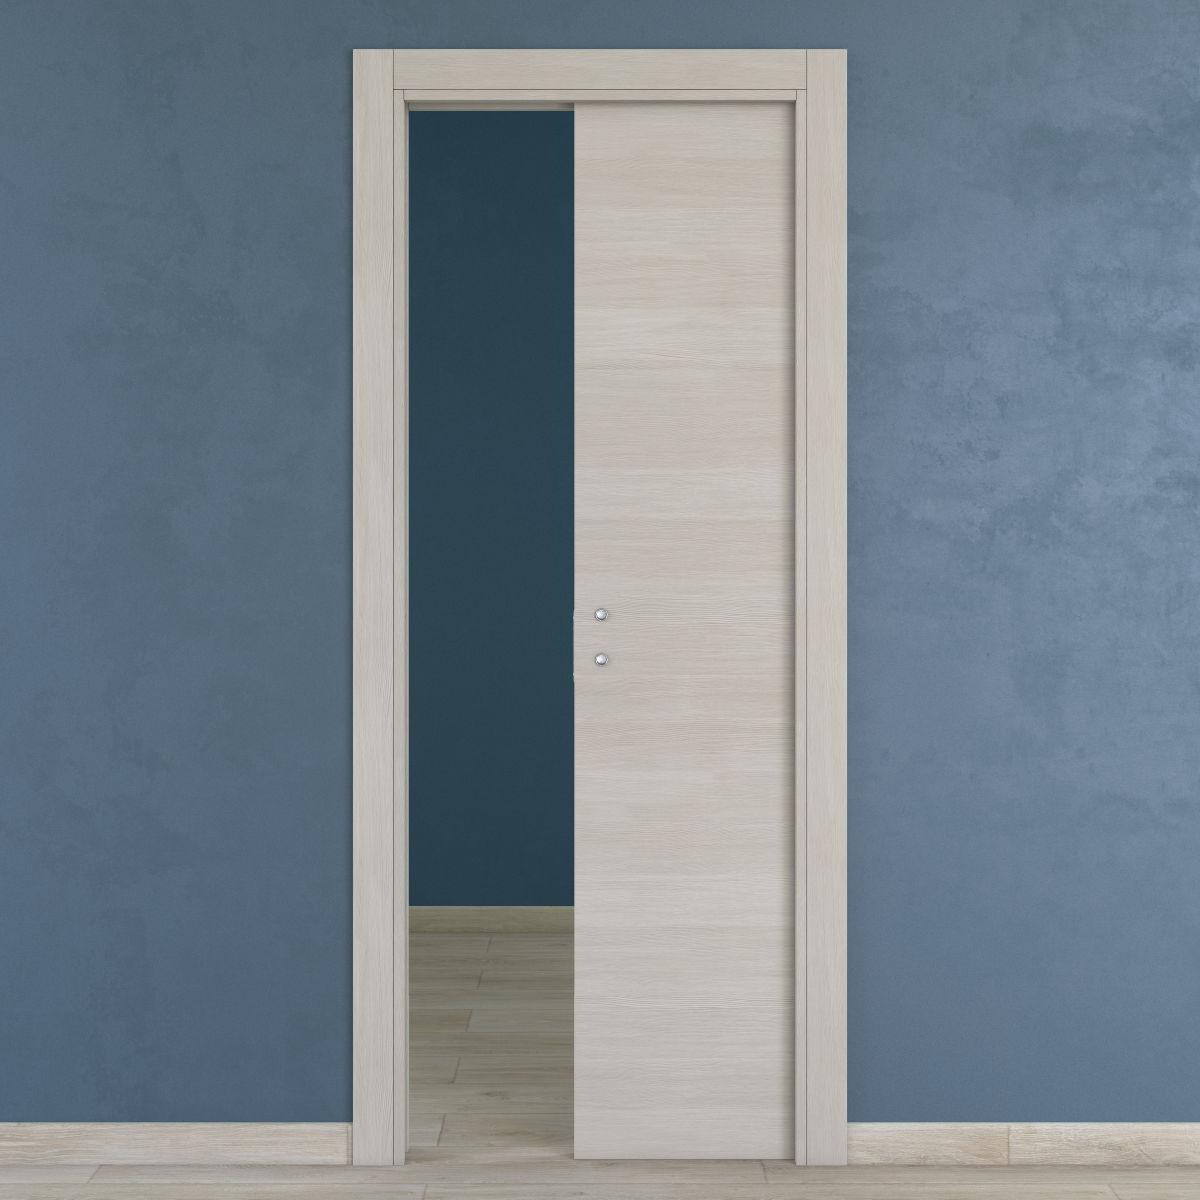 Stunning porte interne scorrevoli prezzi ideas for Porte interne leroy merlin prezzi